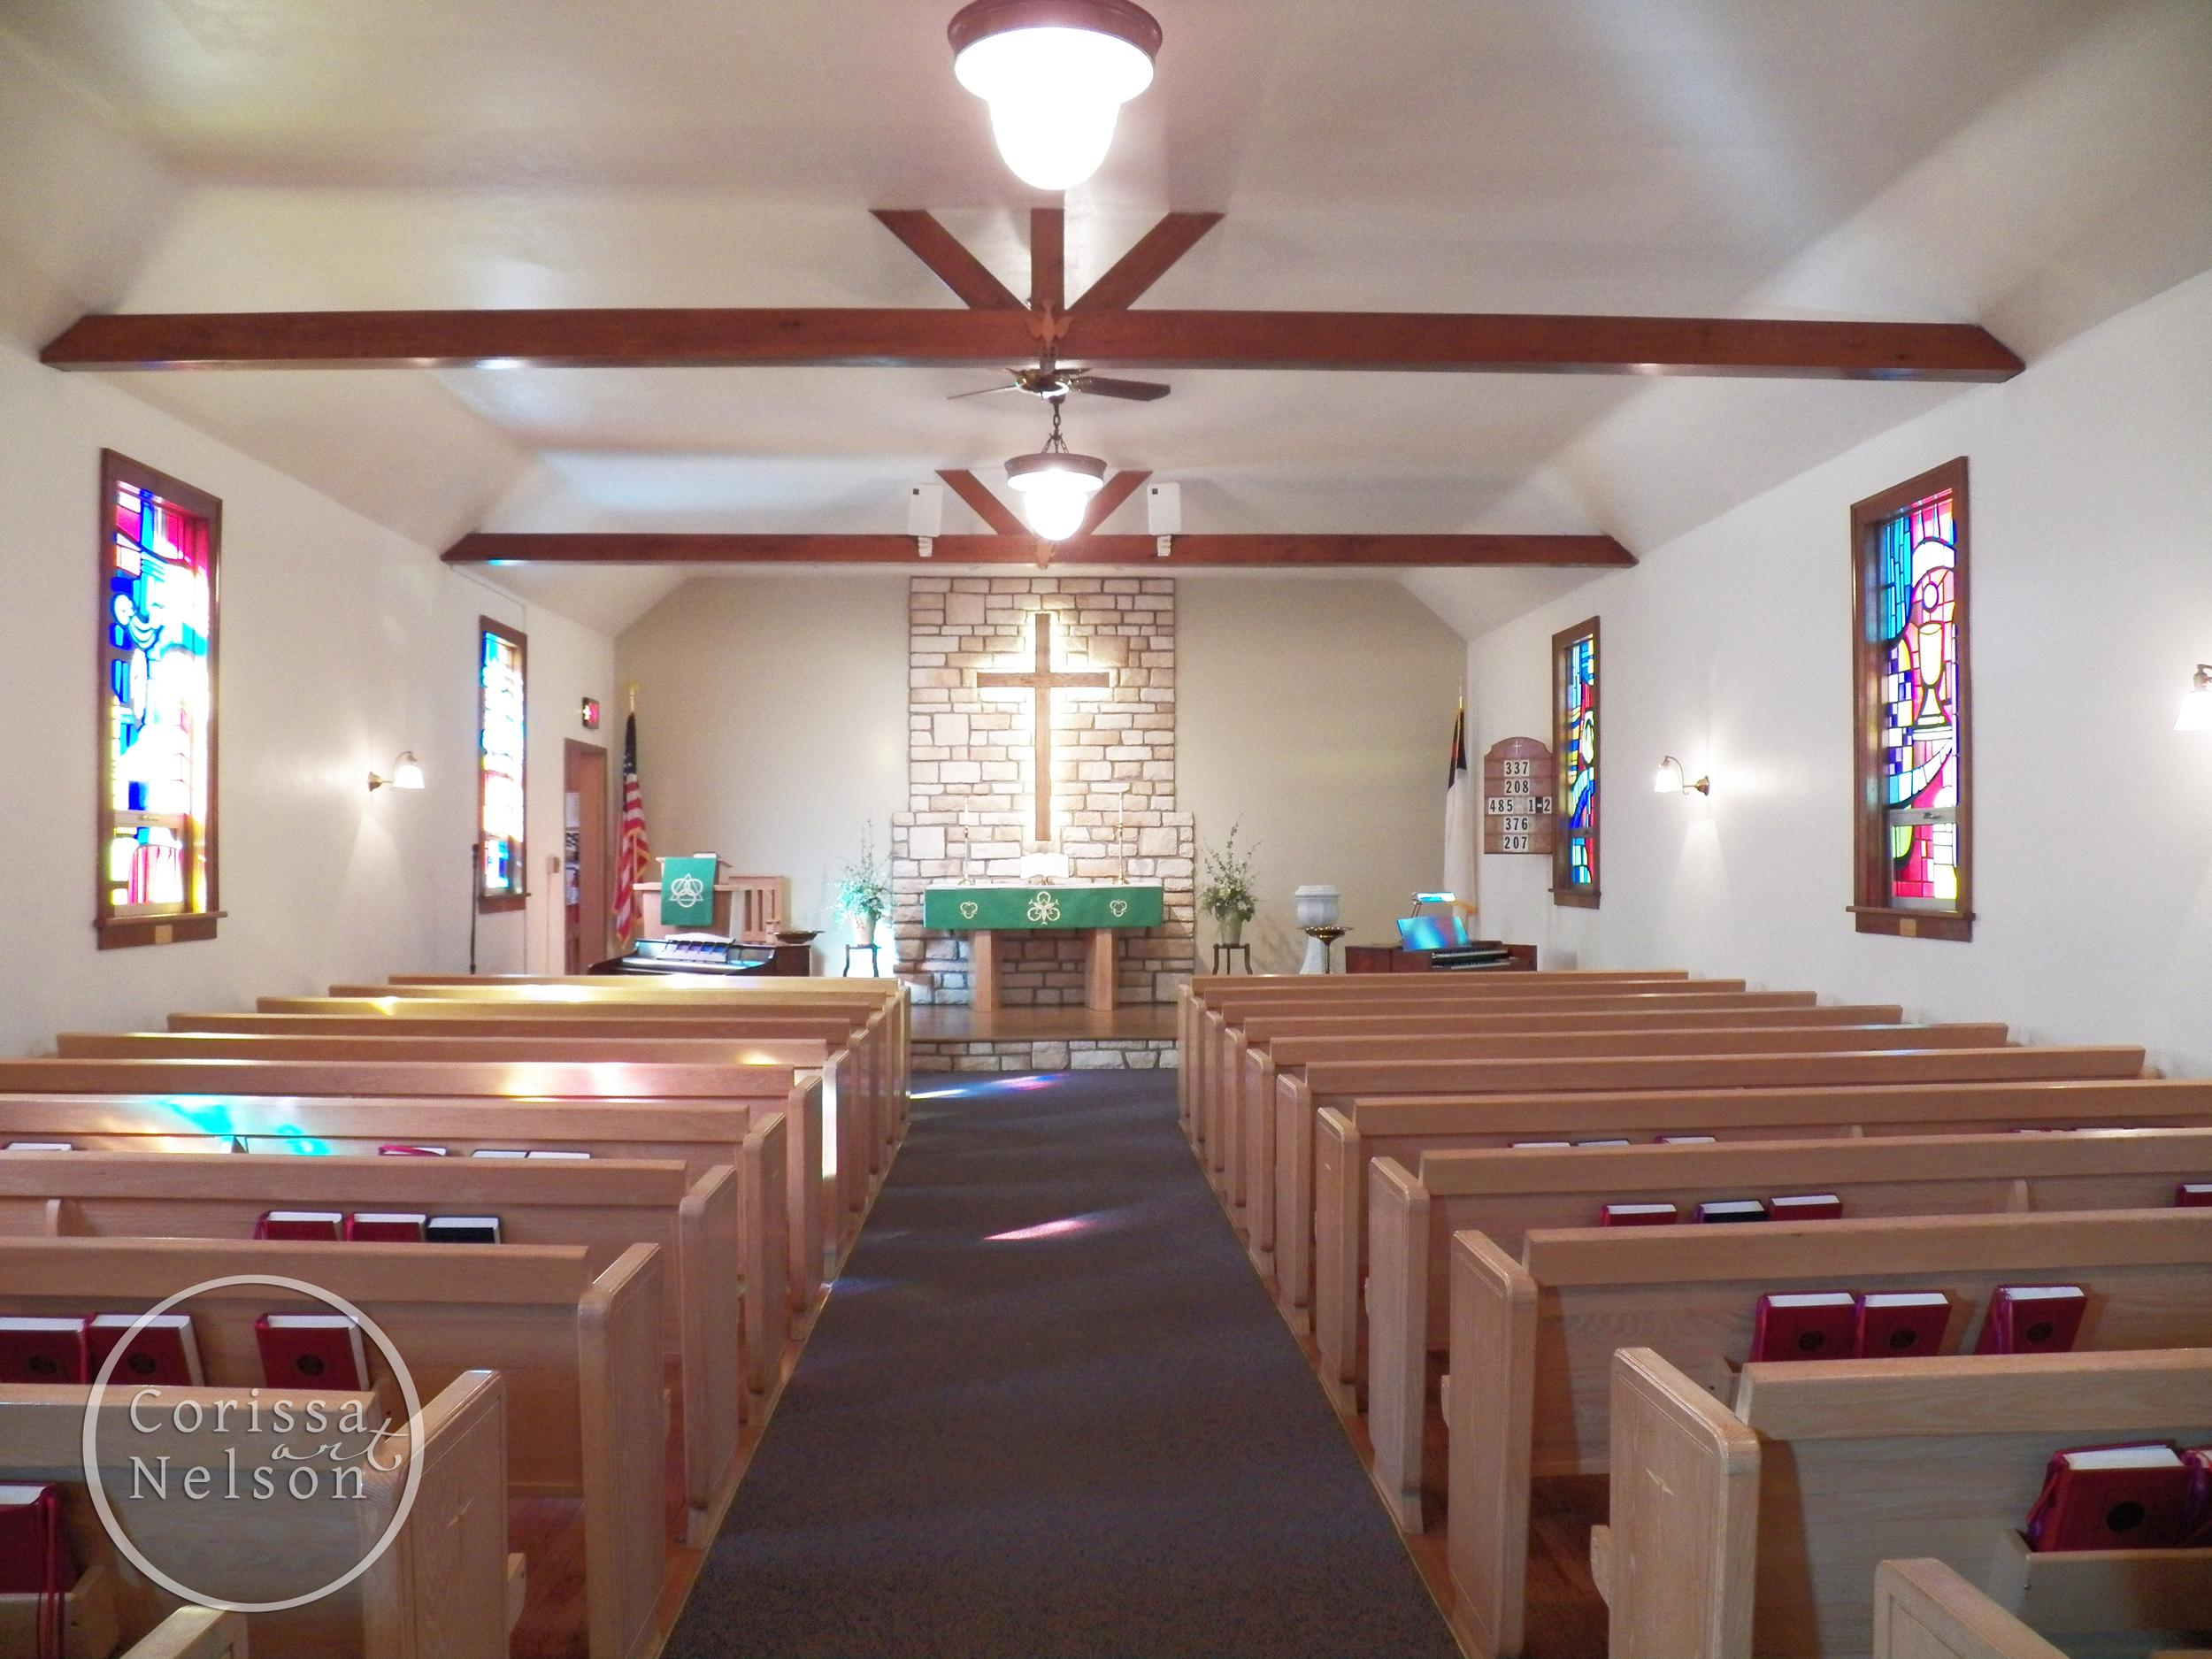 After sanctuary remodel